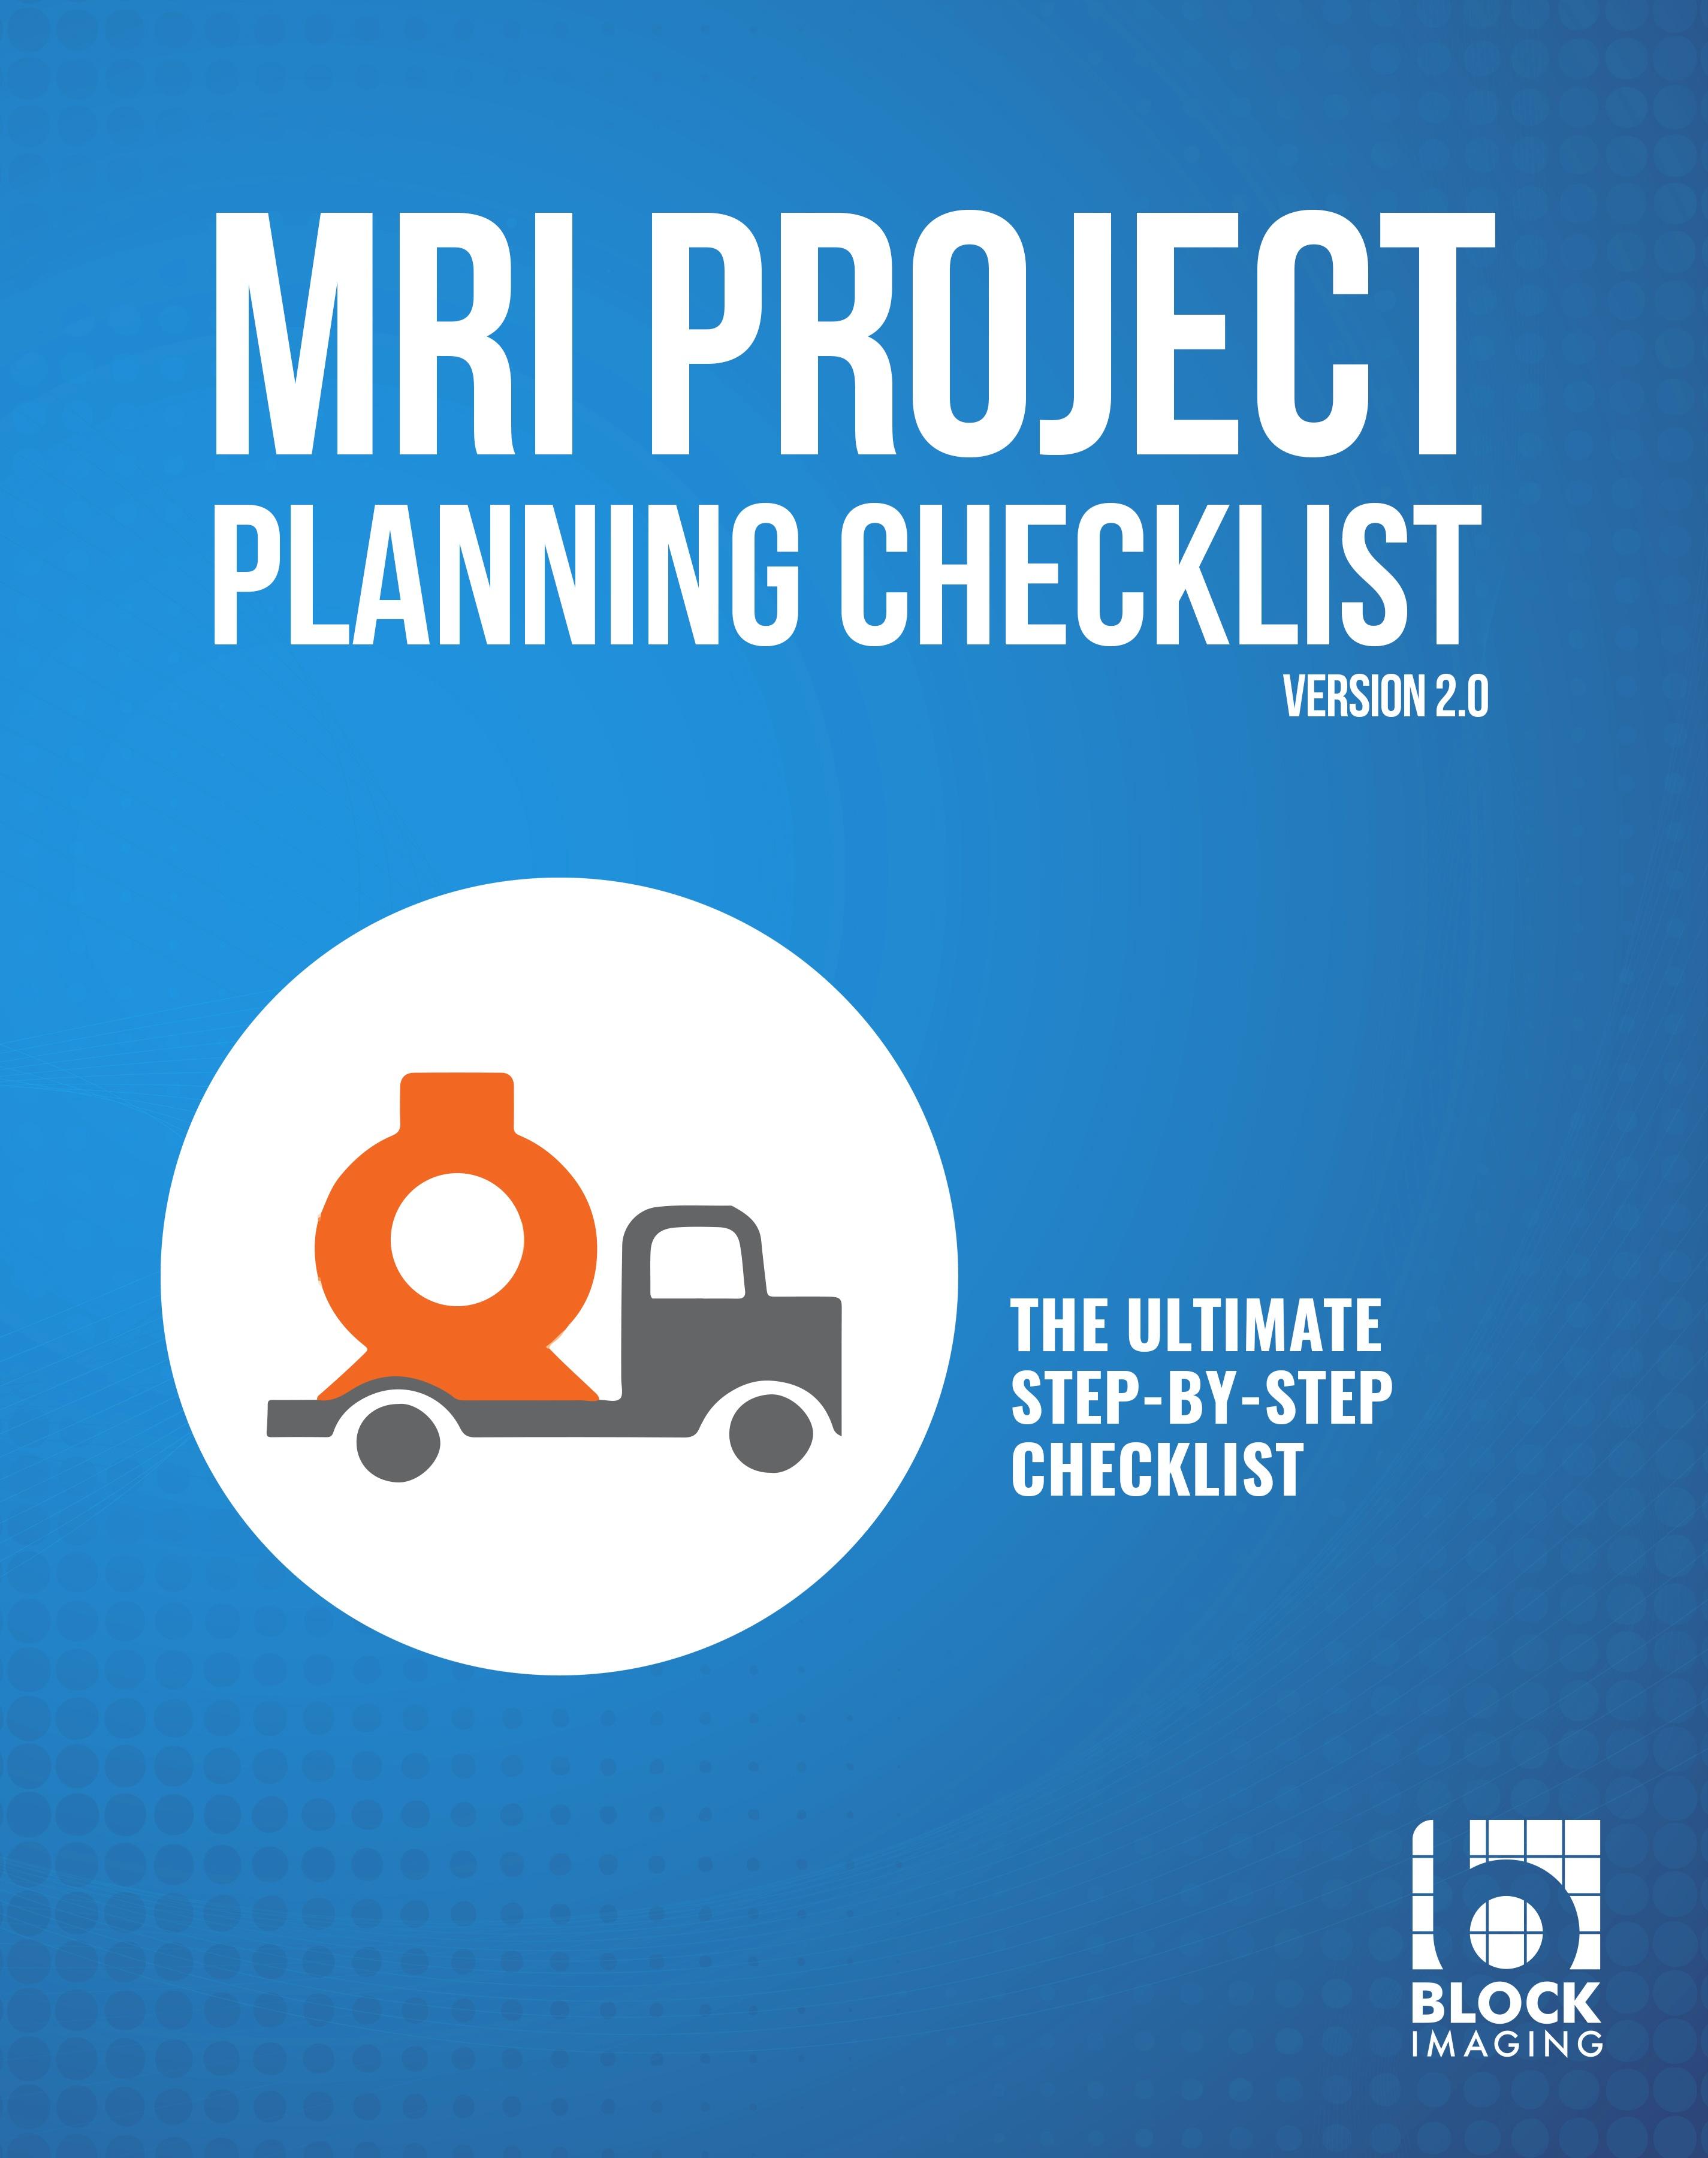 mri_project_planning_checklist_cover_NEW.jpg